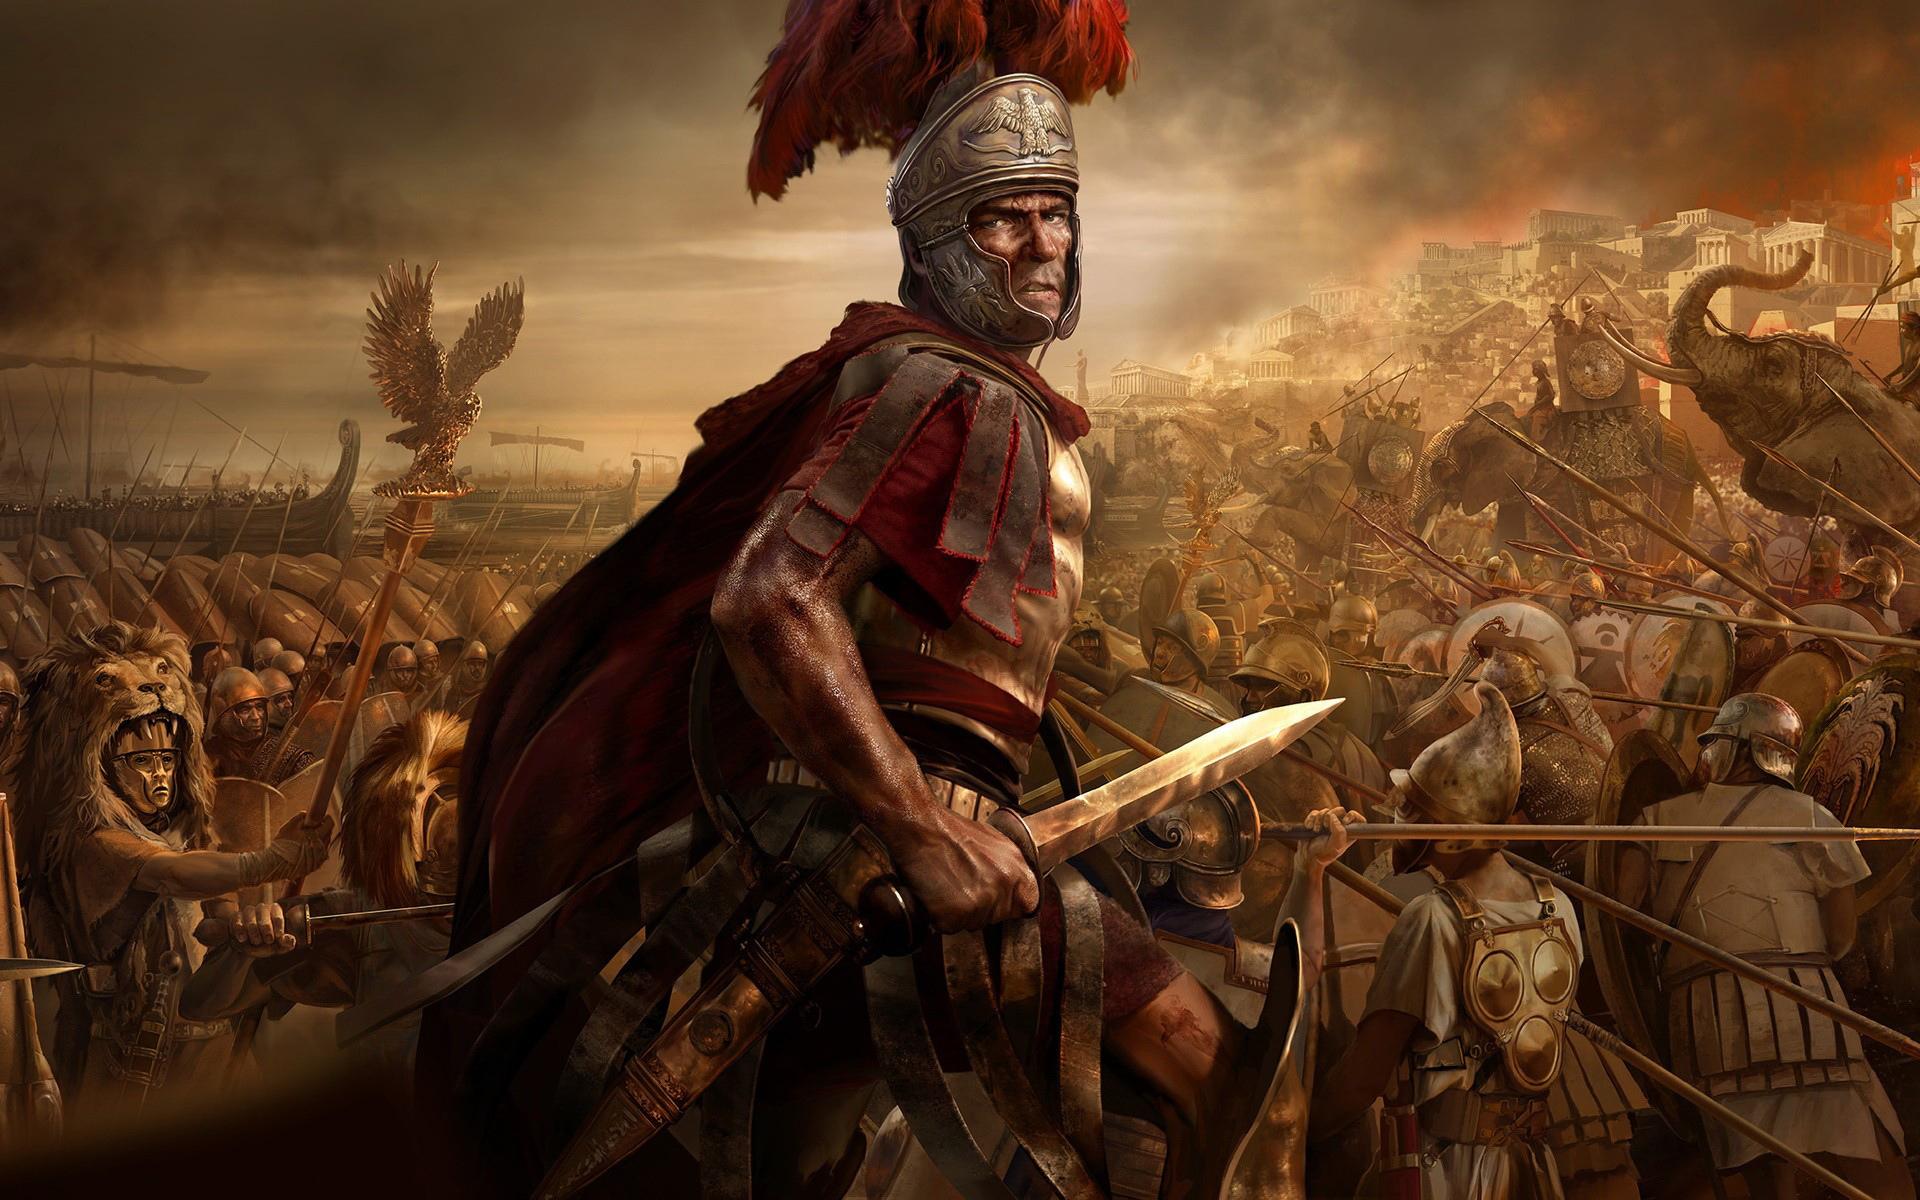 Ryse Son Of Rome Wallpaper: Ryse Son Of Rome Wallpaper